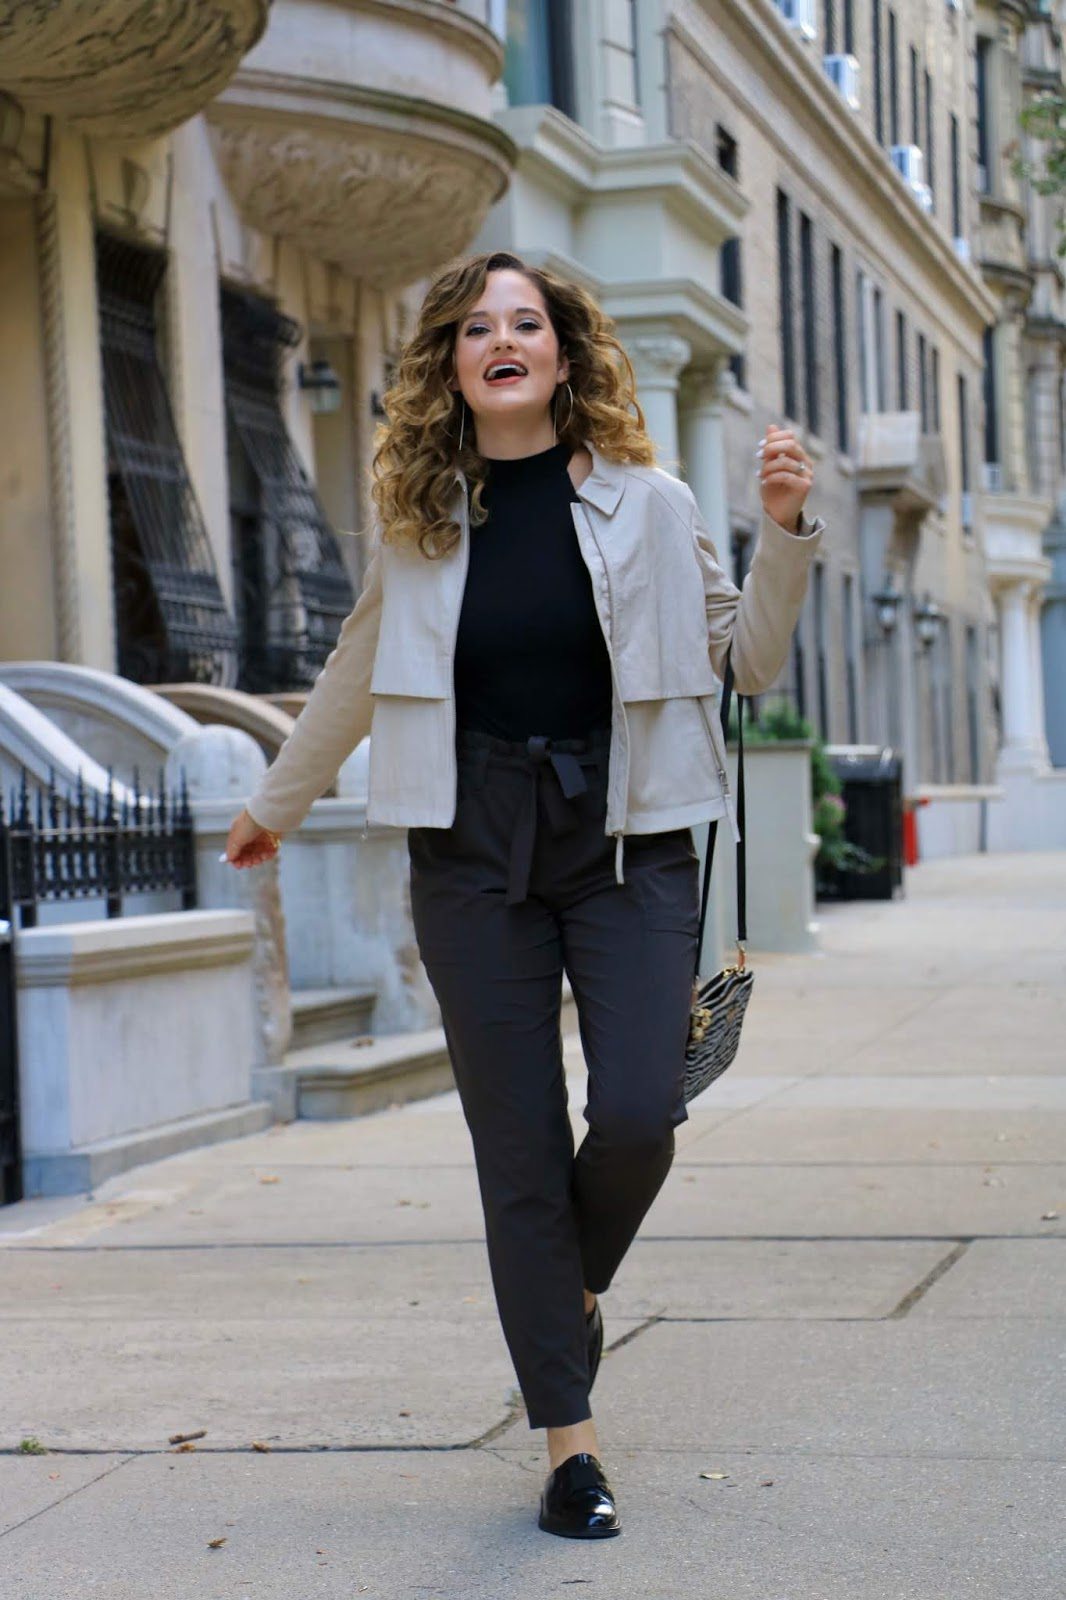 Nyc fashion blogger Kathleen Harper's fall fashion outfit ideas.